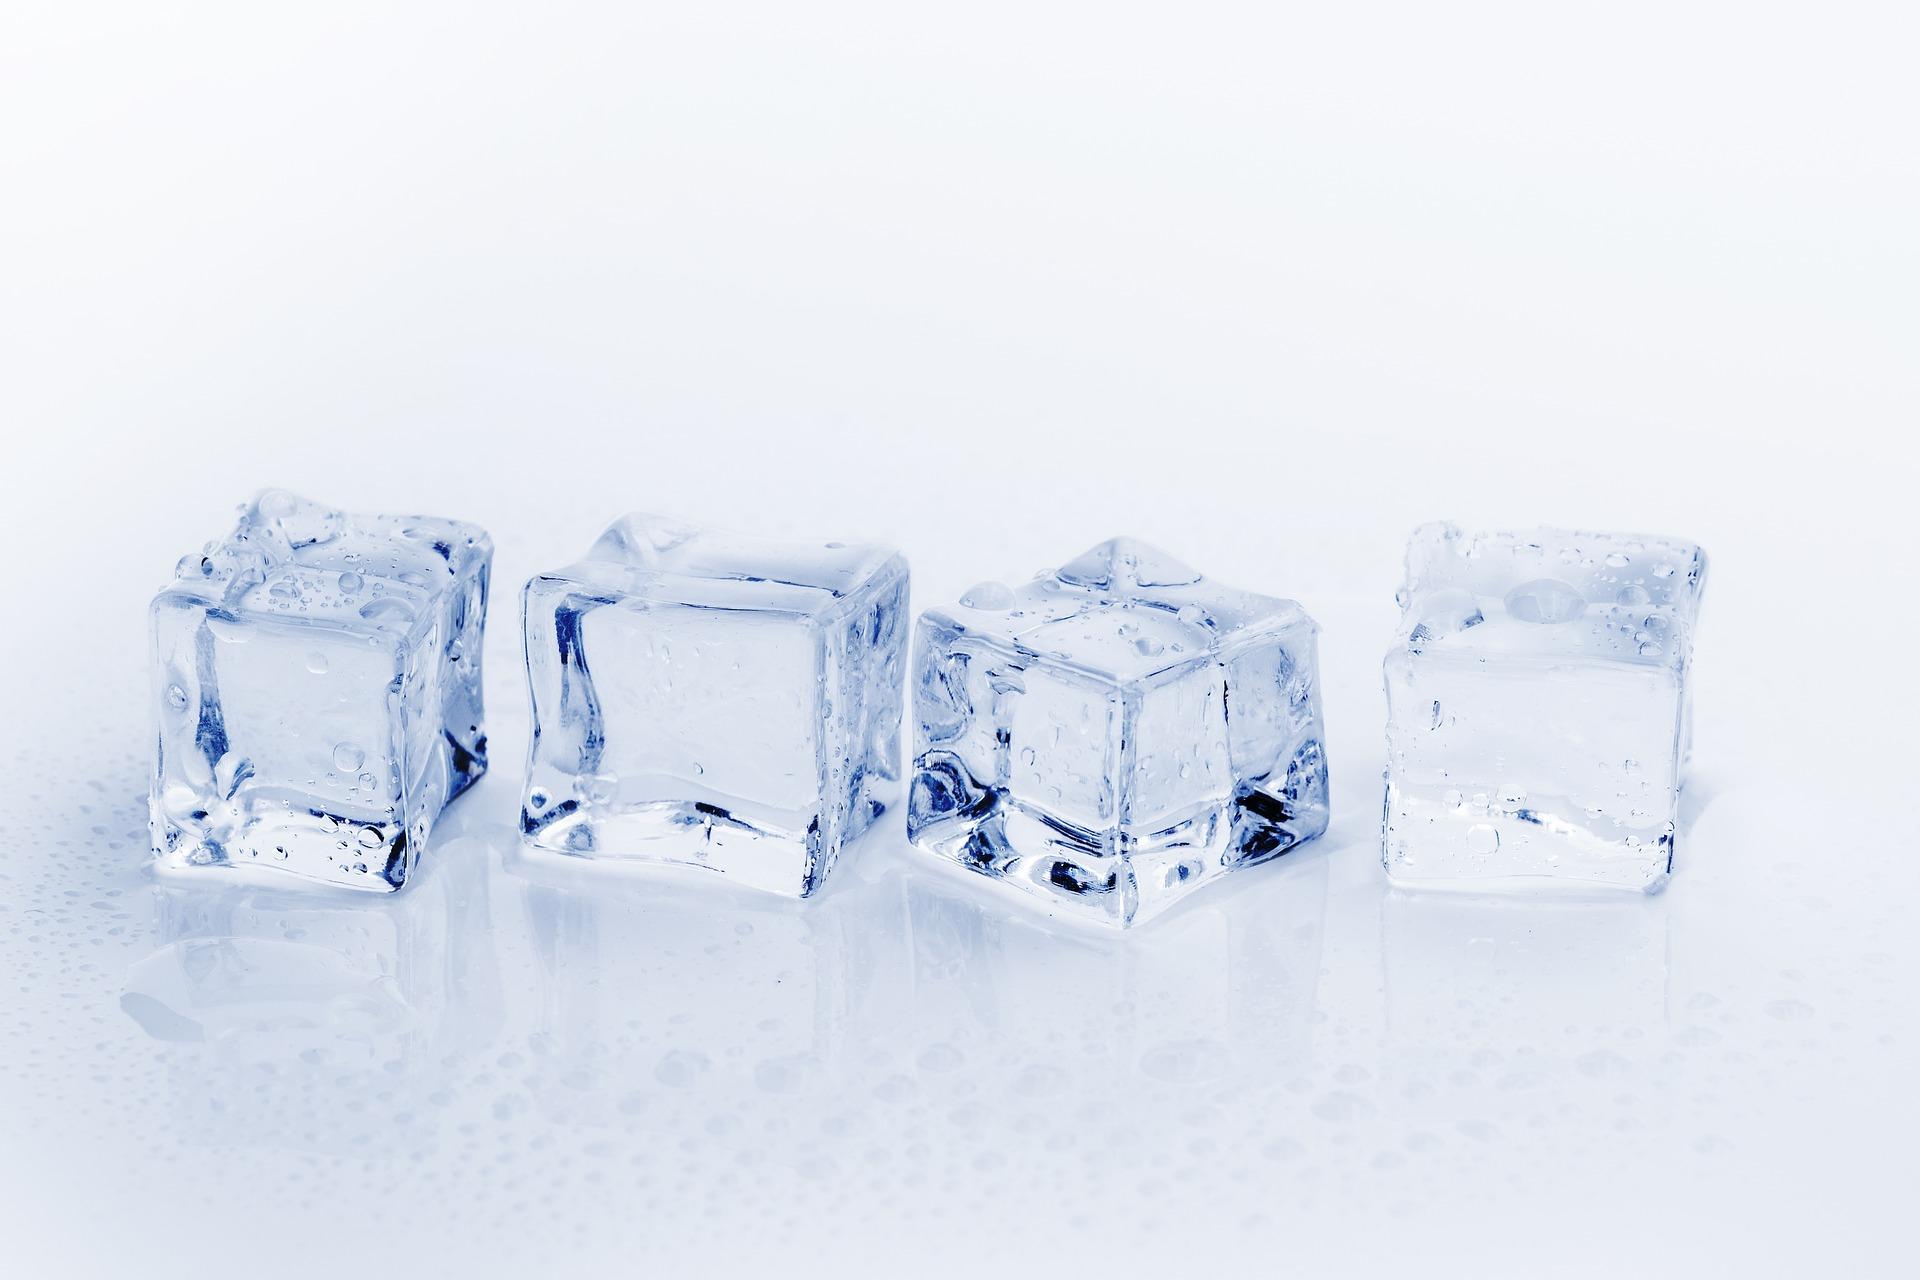 Kühlschrank Cube : Großhandel grid ice cube abdeckung eismaschine diy form